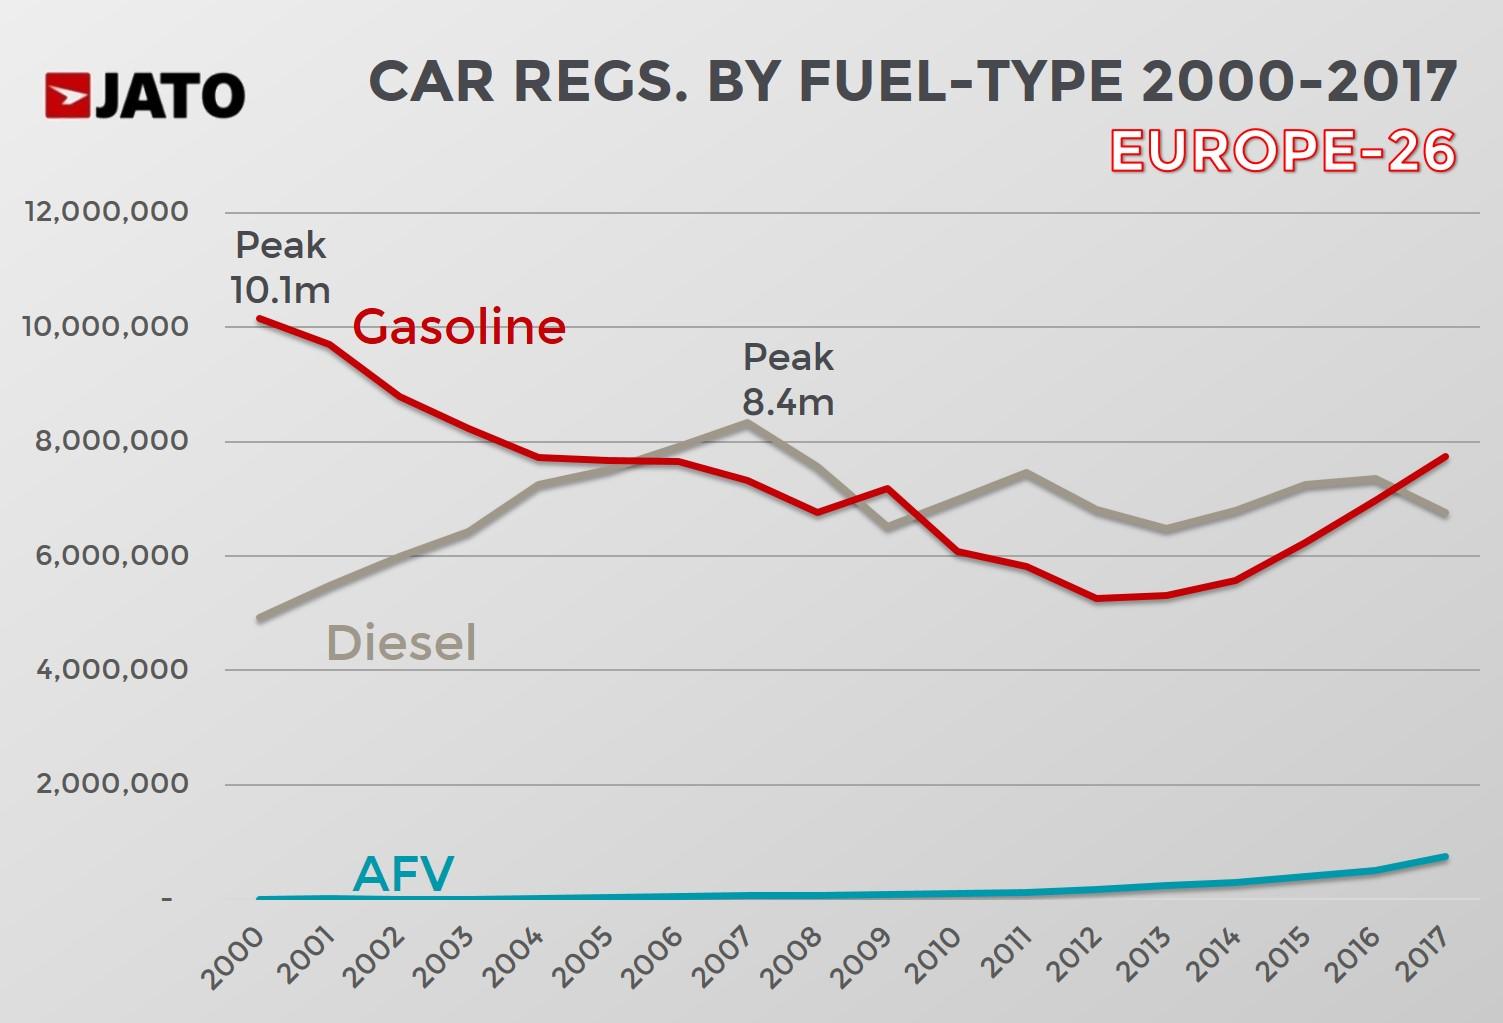 Diesel In Europe In 2017 Annus Horribilis Jato